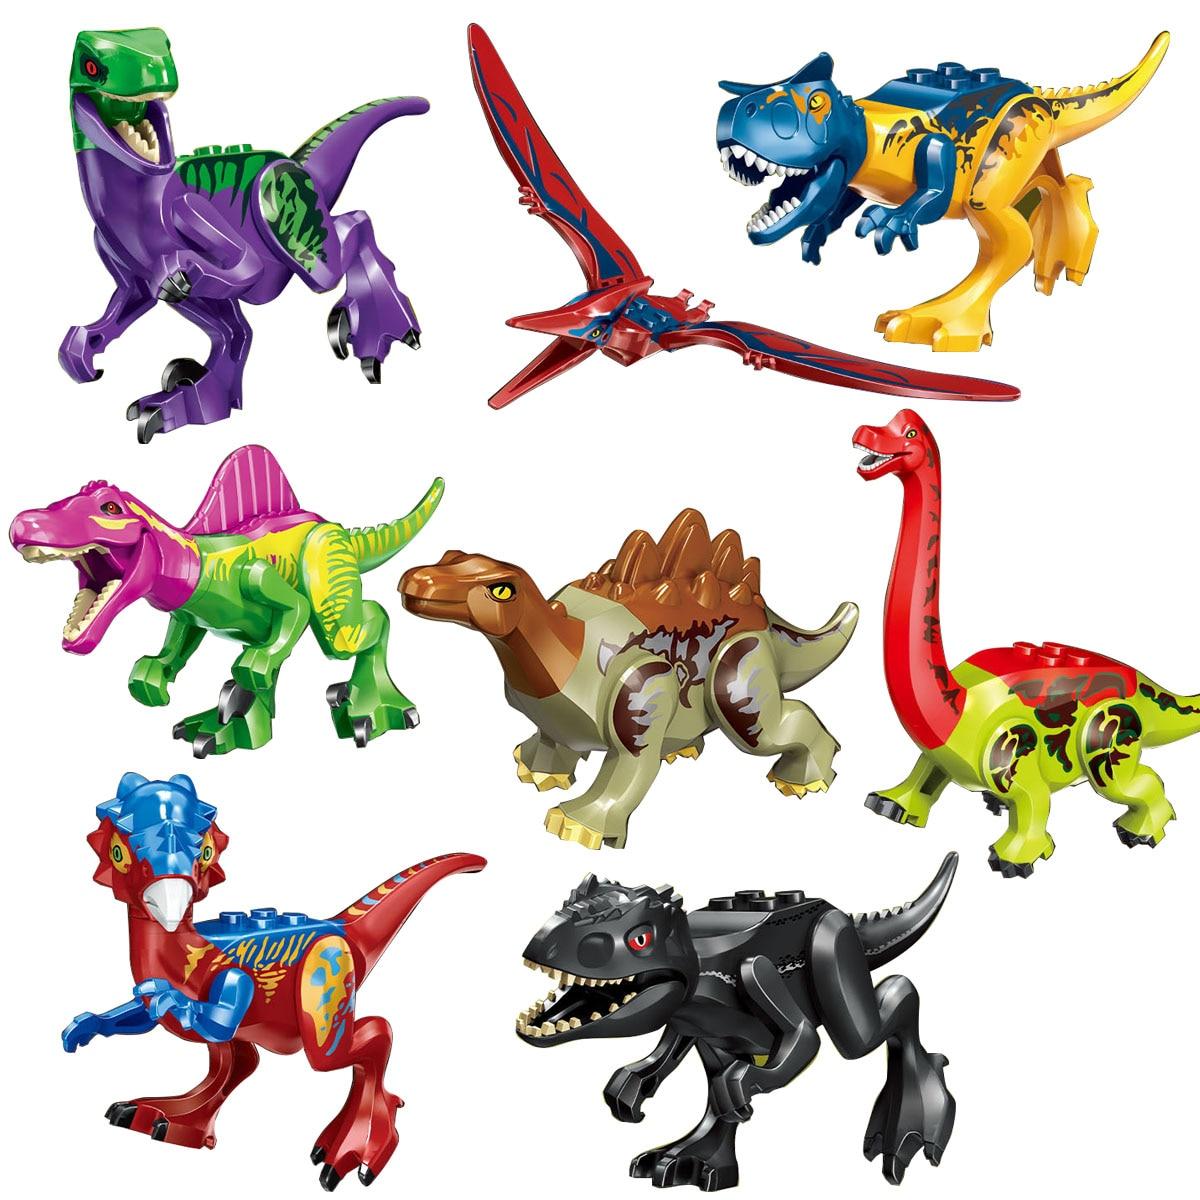 Mailackers Jurassic Dinosaurs Movies Rex Dilophosaurus Velociraptor Tyrannosaurus Figures Building Blocks Models Toys Kits 77070